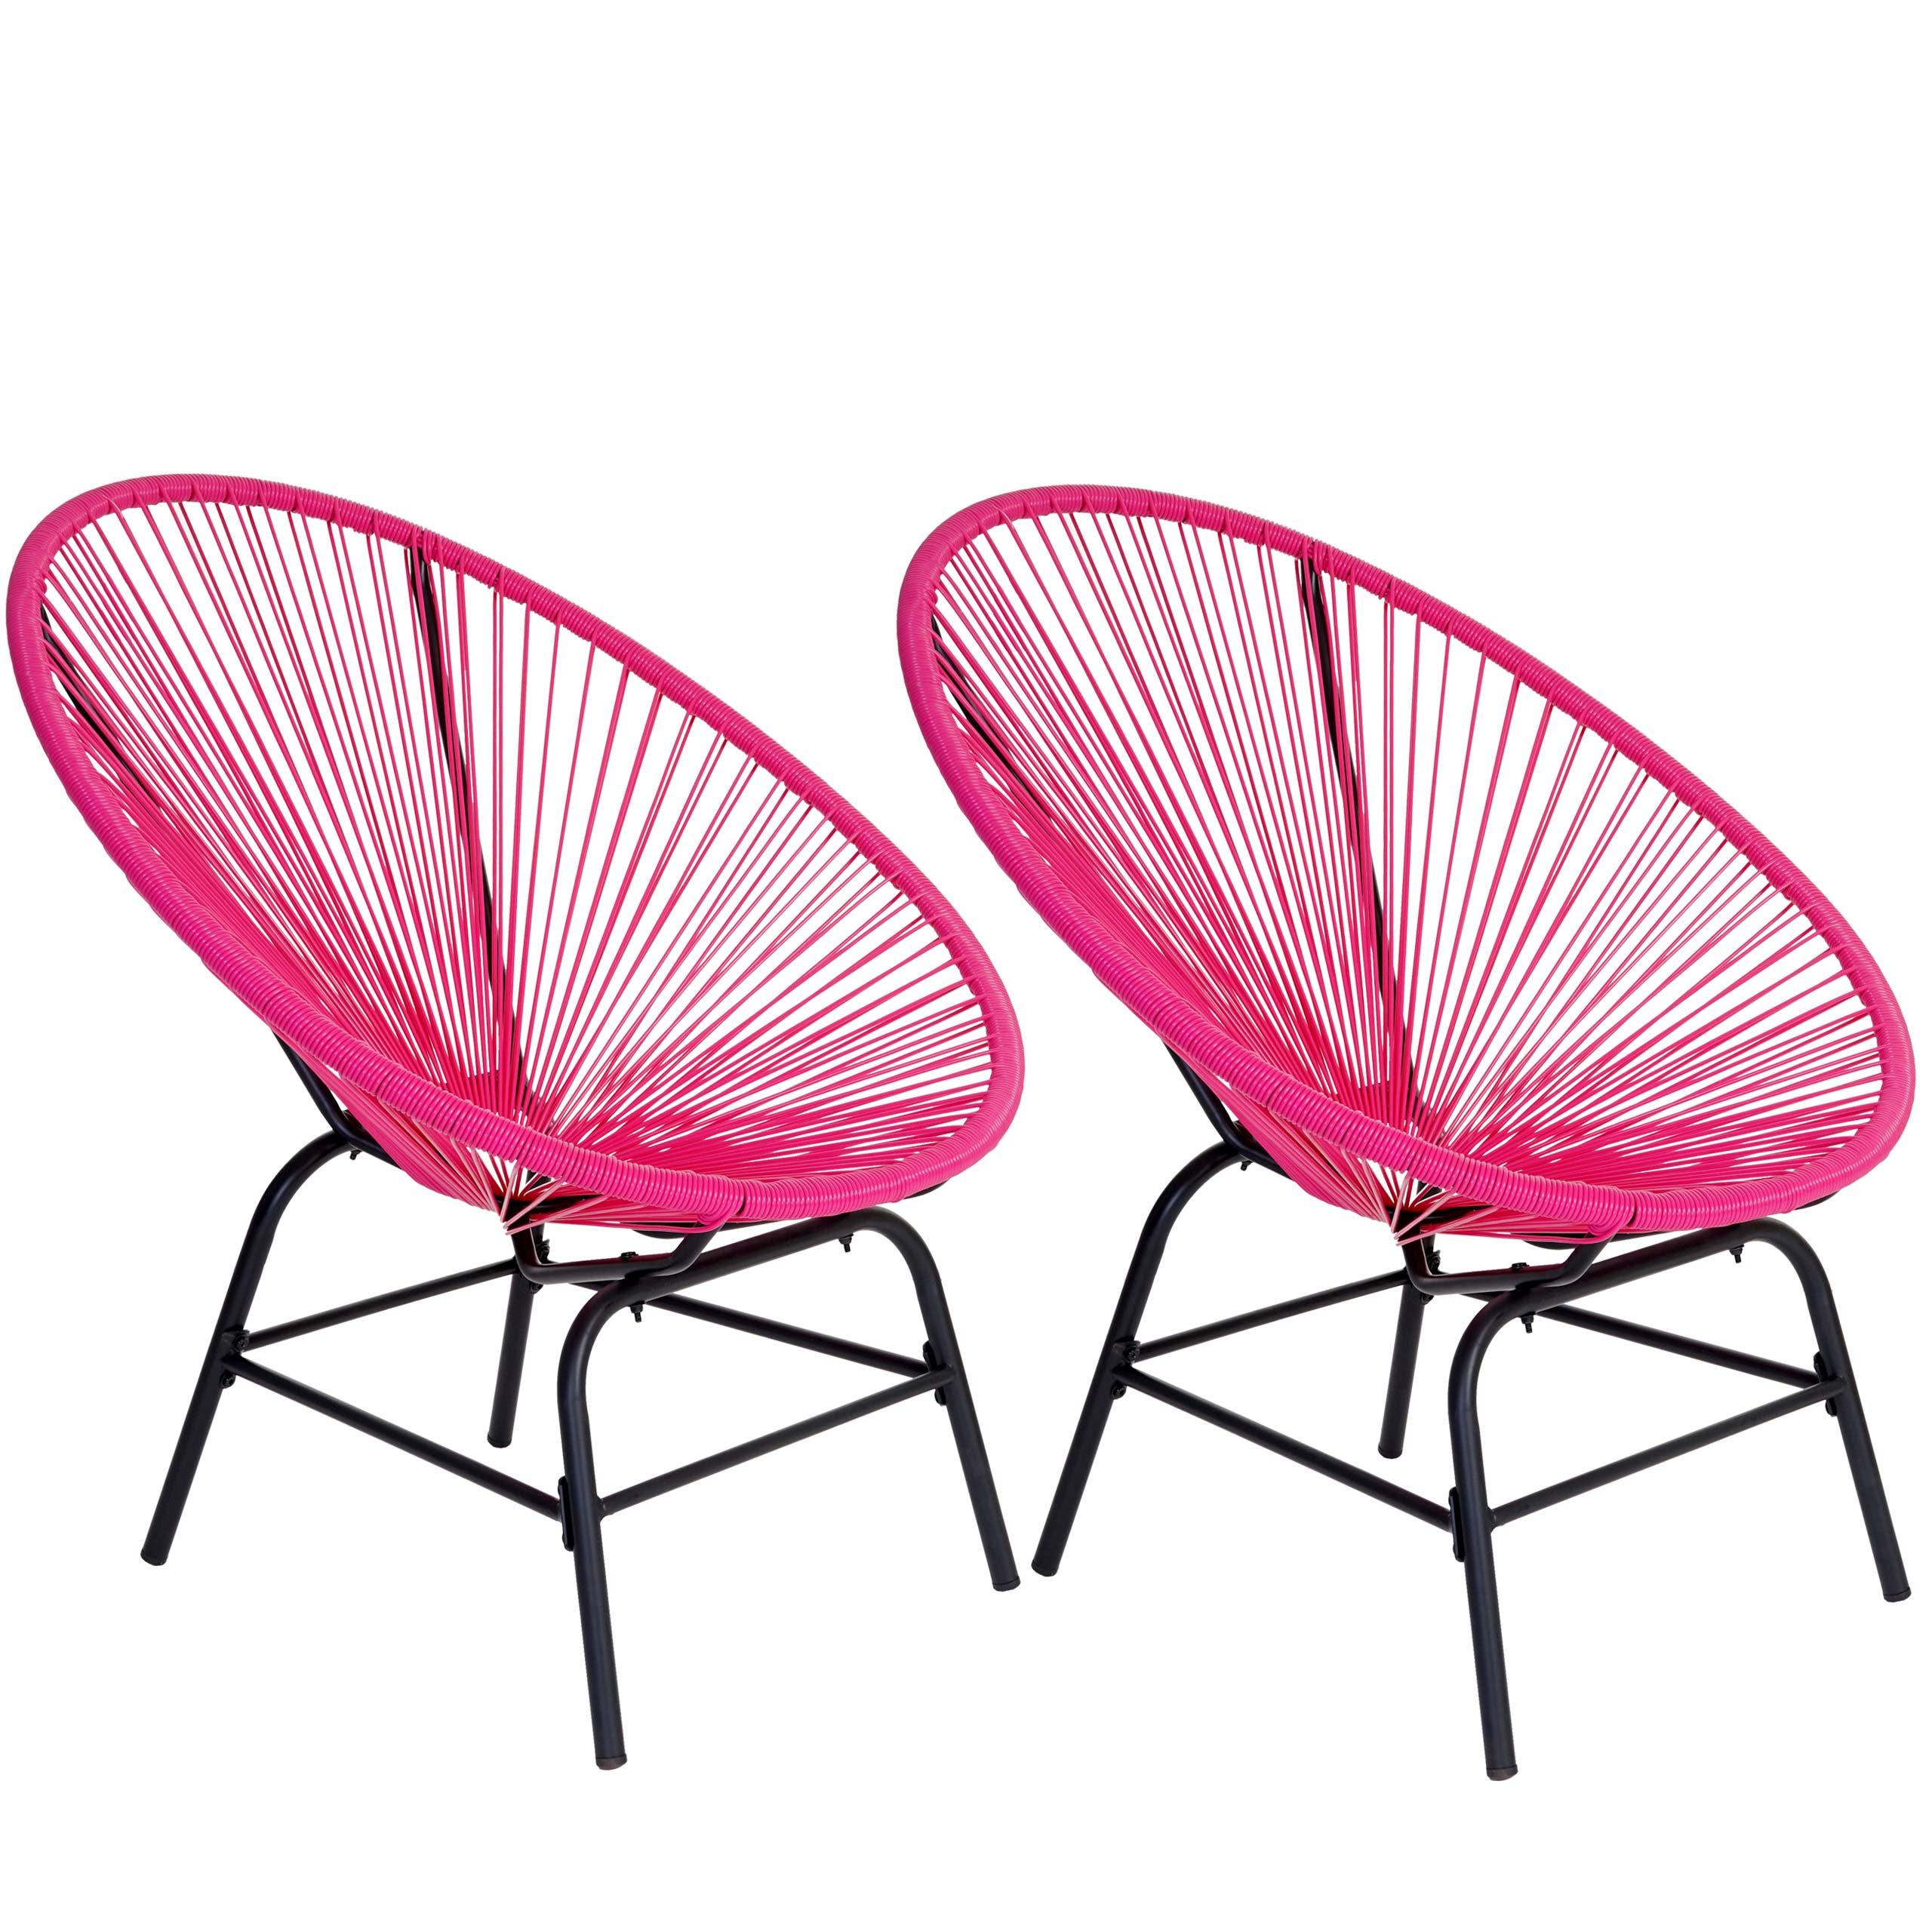 2x poly rattan gartensessel suzano spaghetti stuhl 70er retro pink ebay. Black Bedroom Furniture Sets. Home Design Ideas